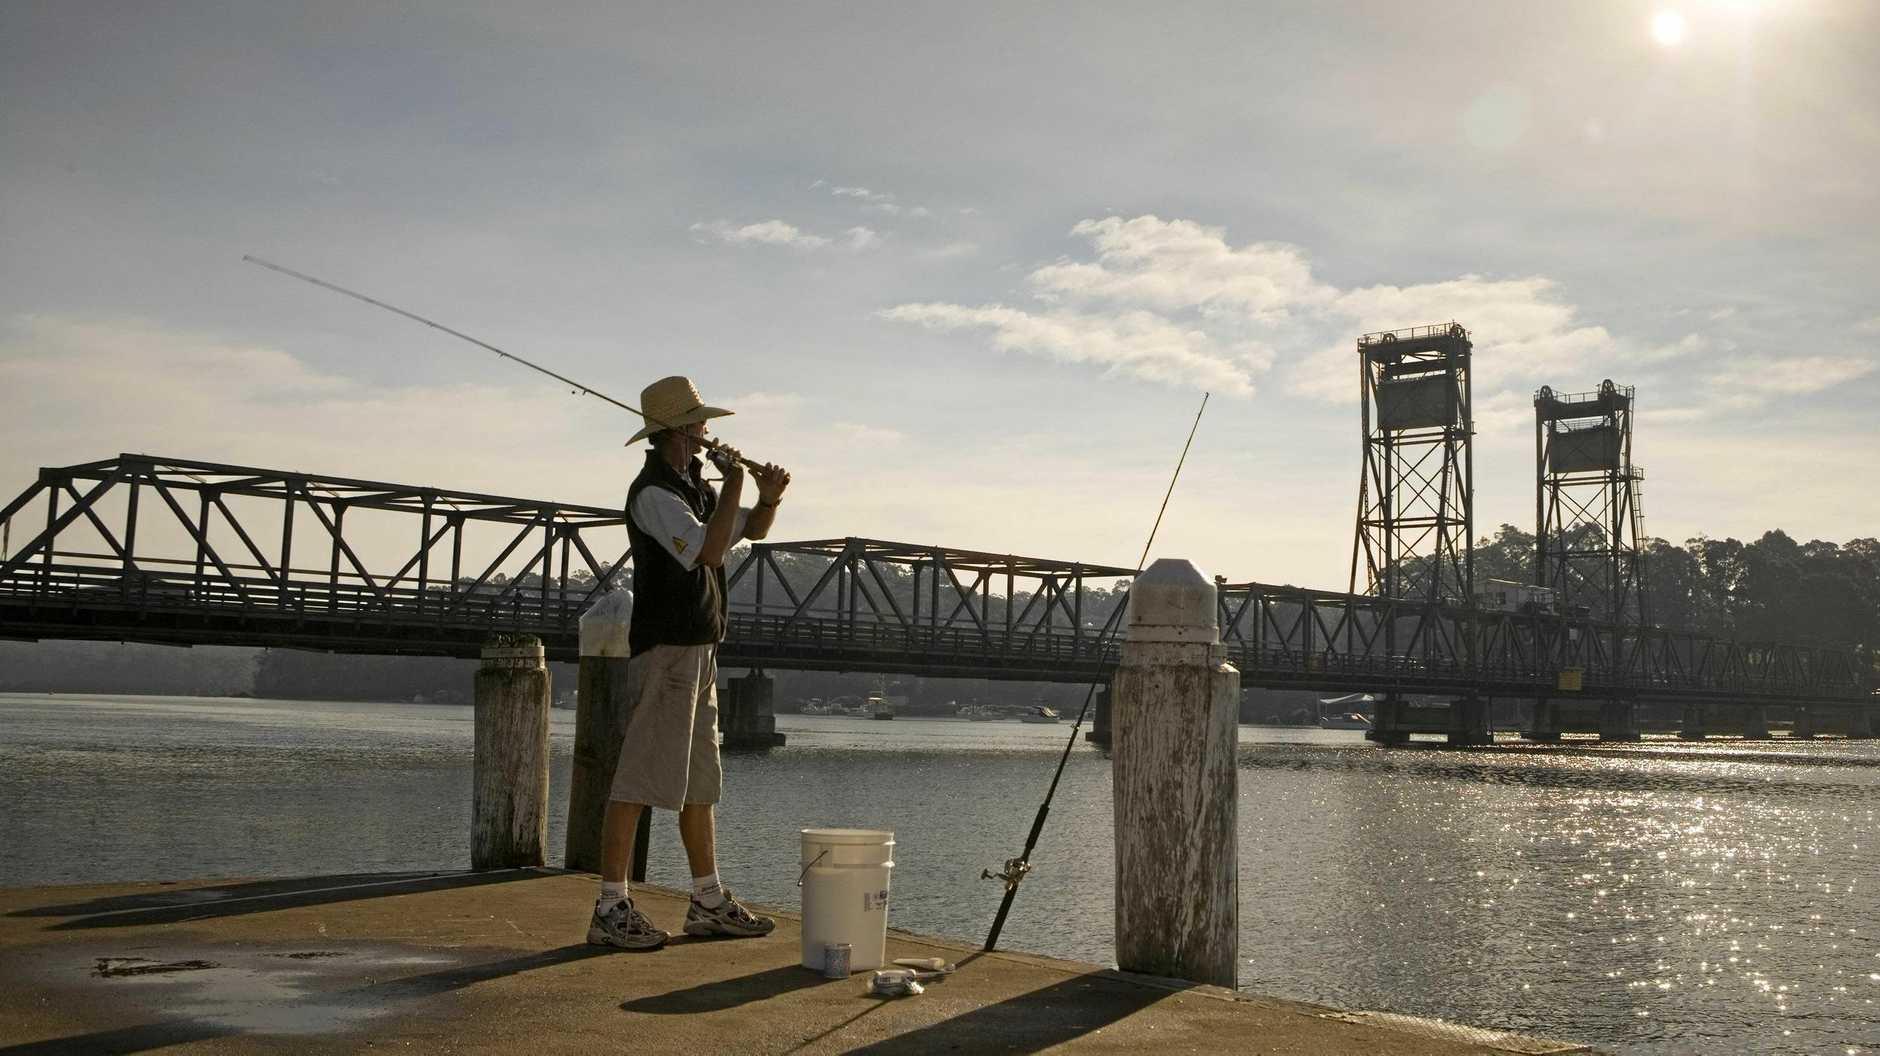 Fishing near the Princes Highway bridge at Batemans Bay, South Coast.